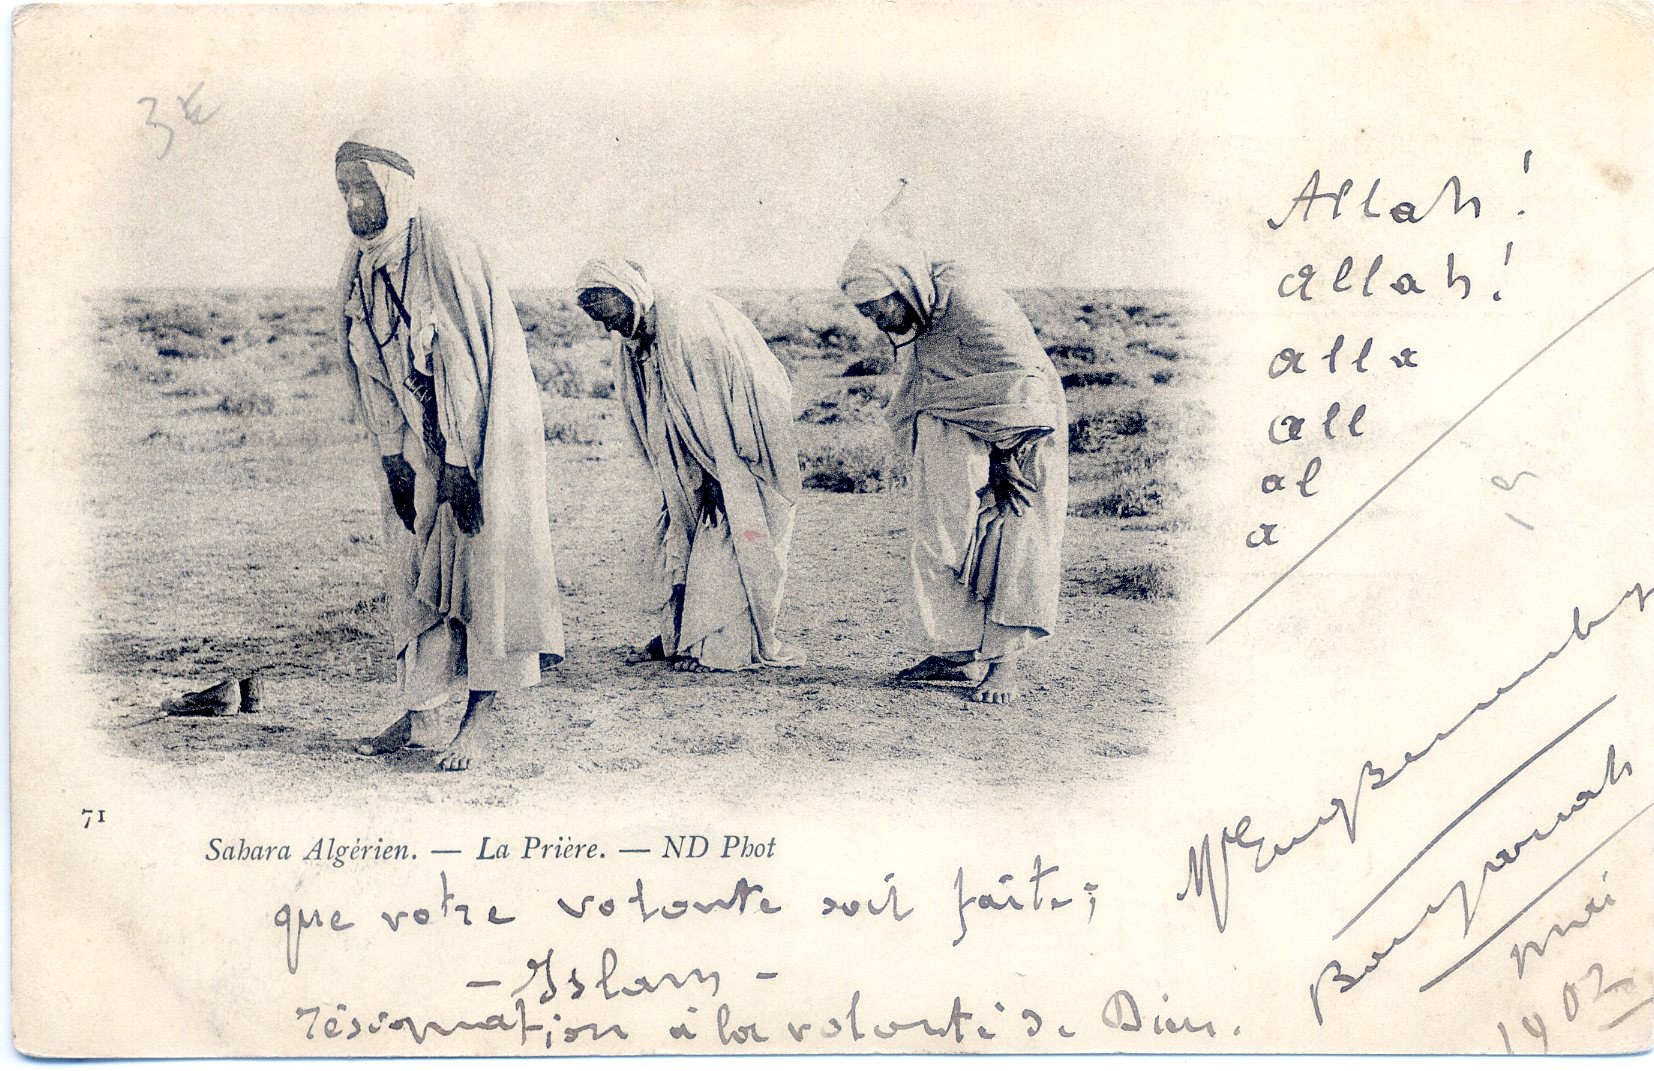 Algerian Muslims